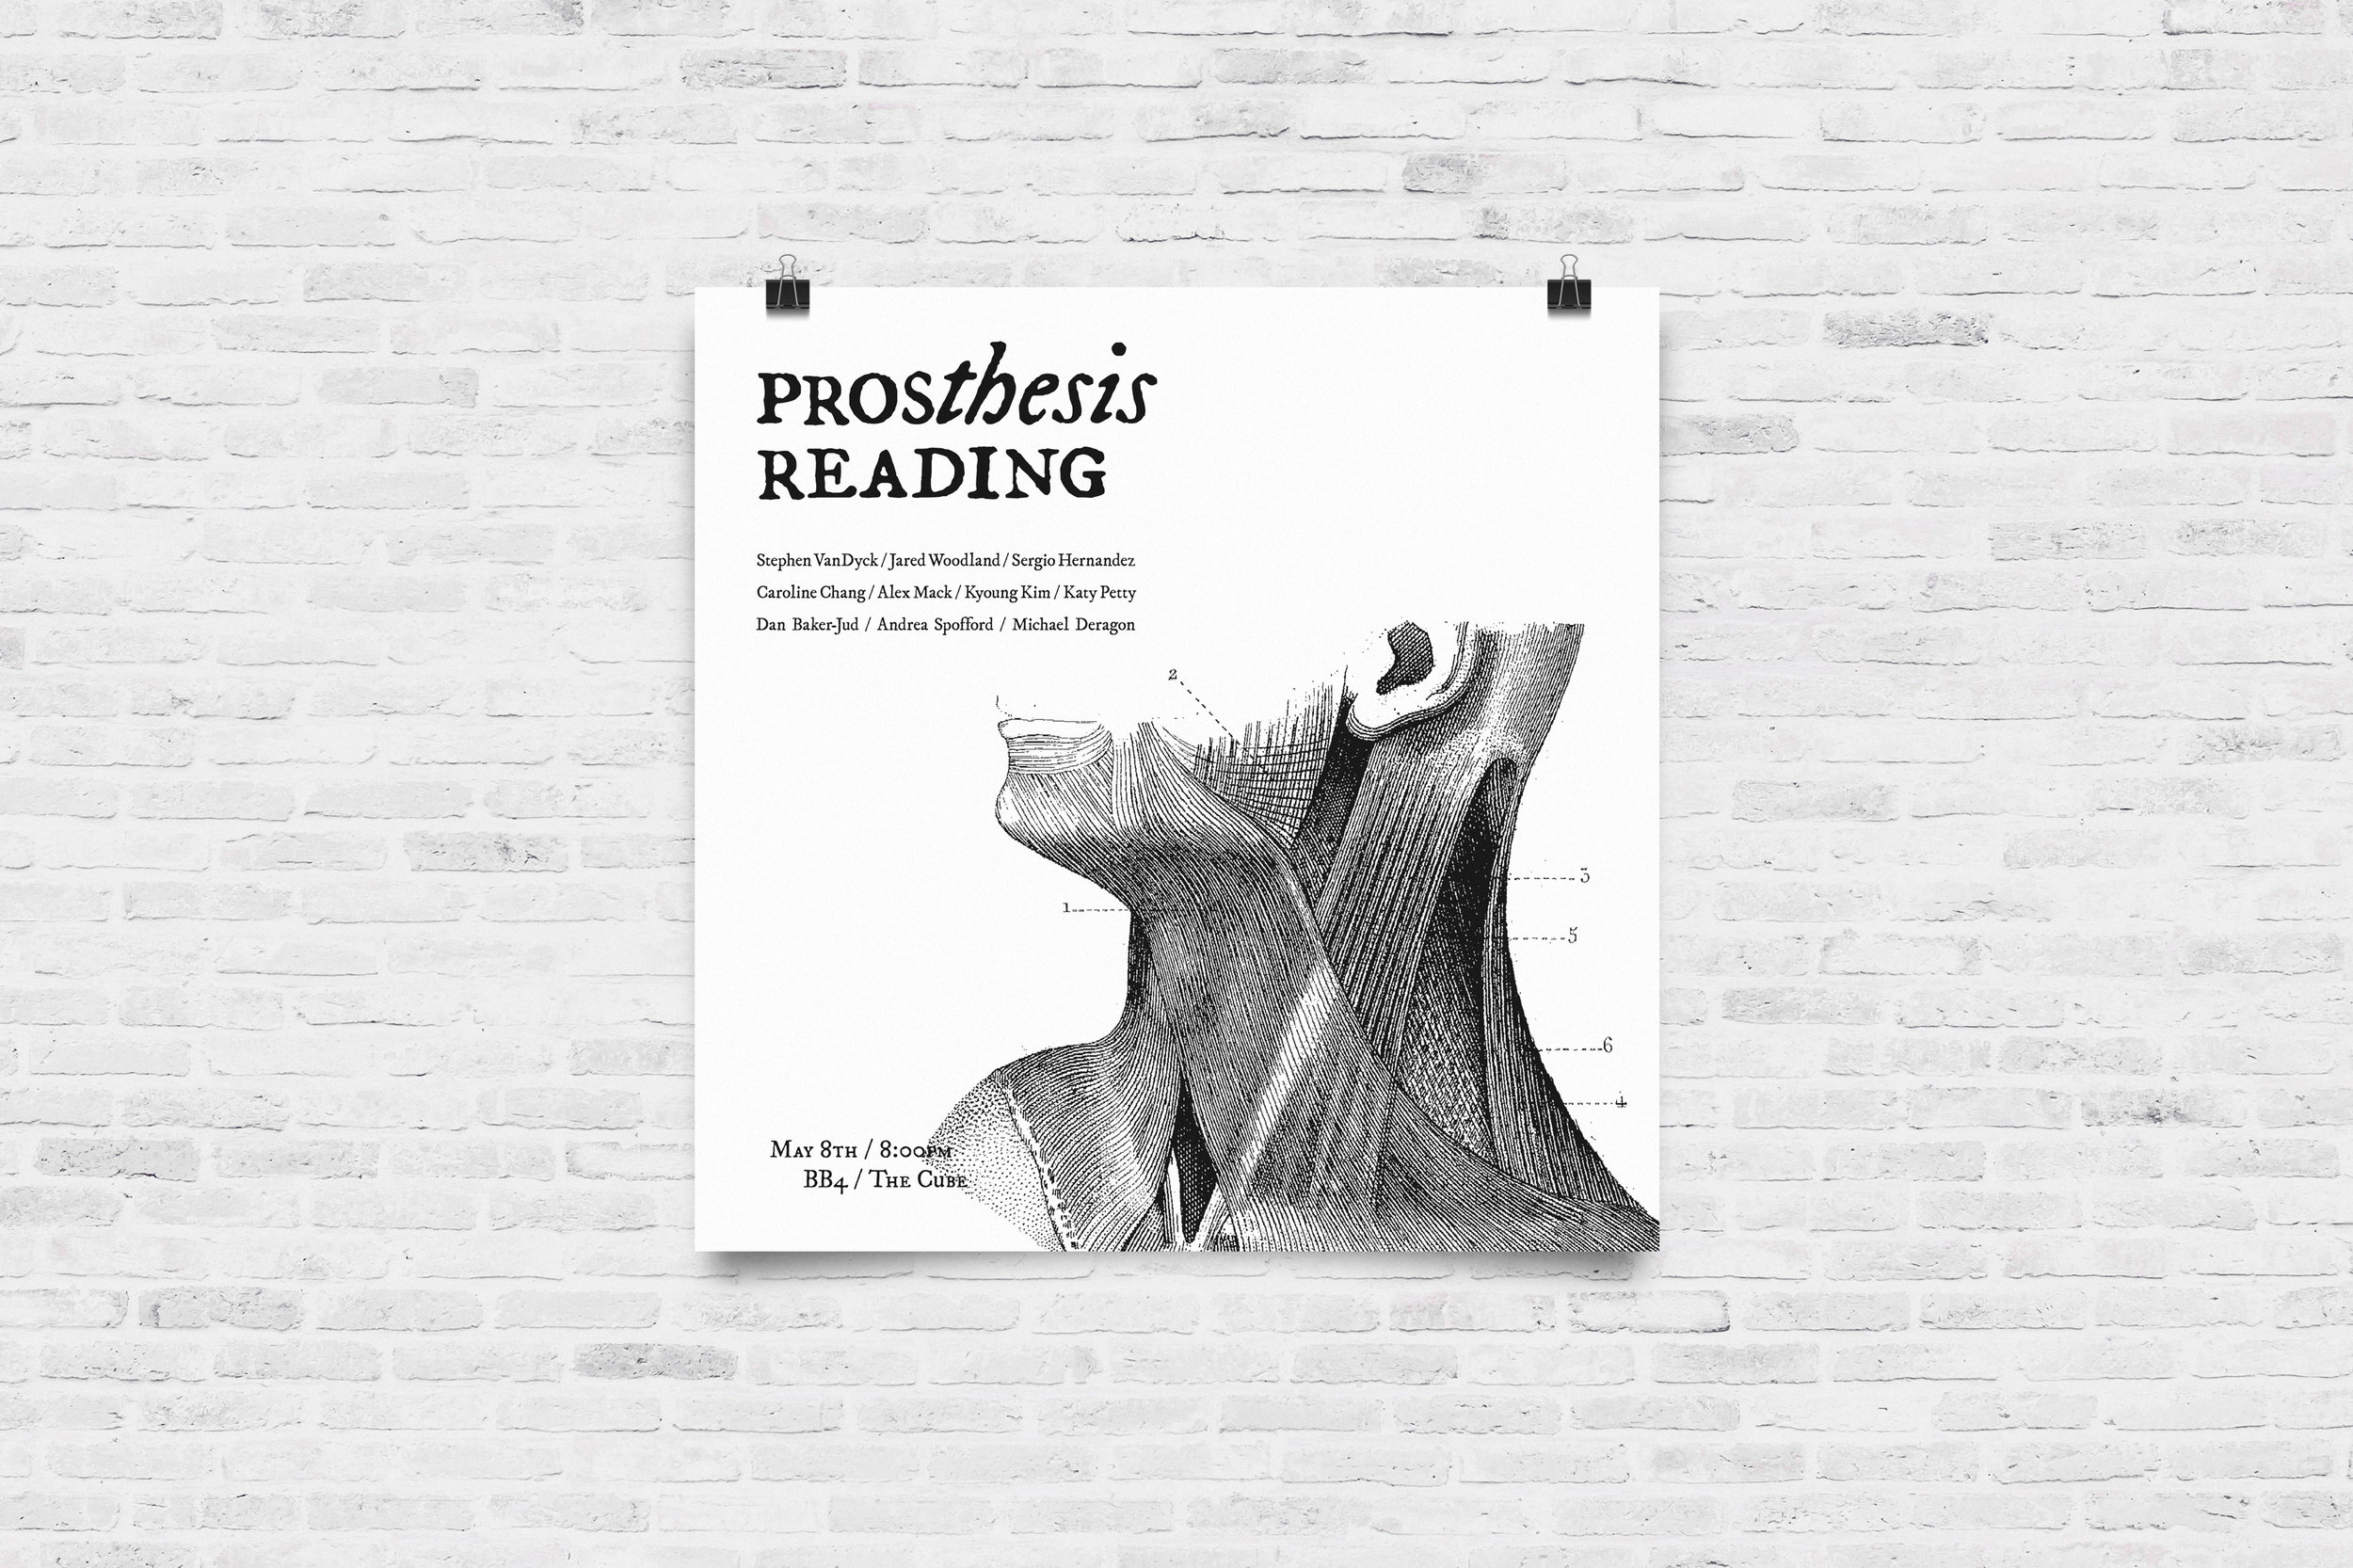 prosthesis_2x3_12.jpg